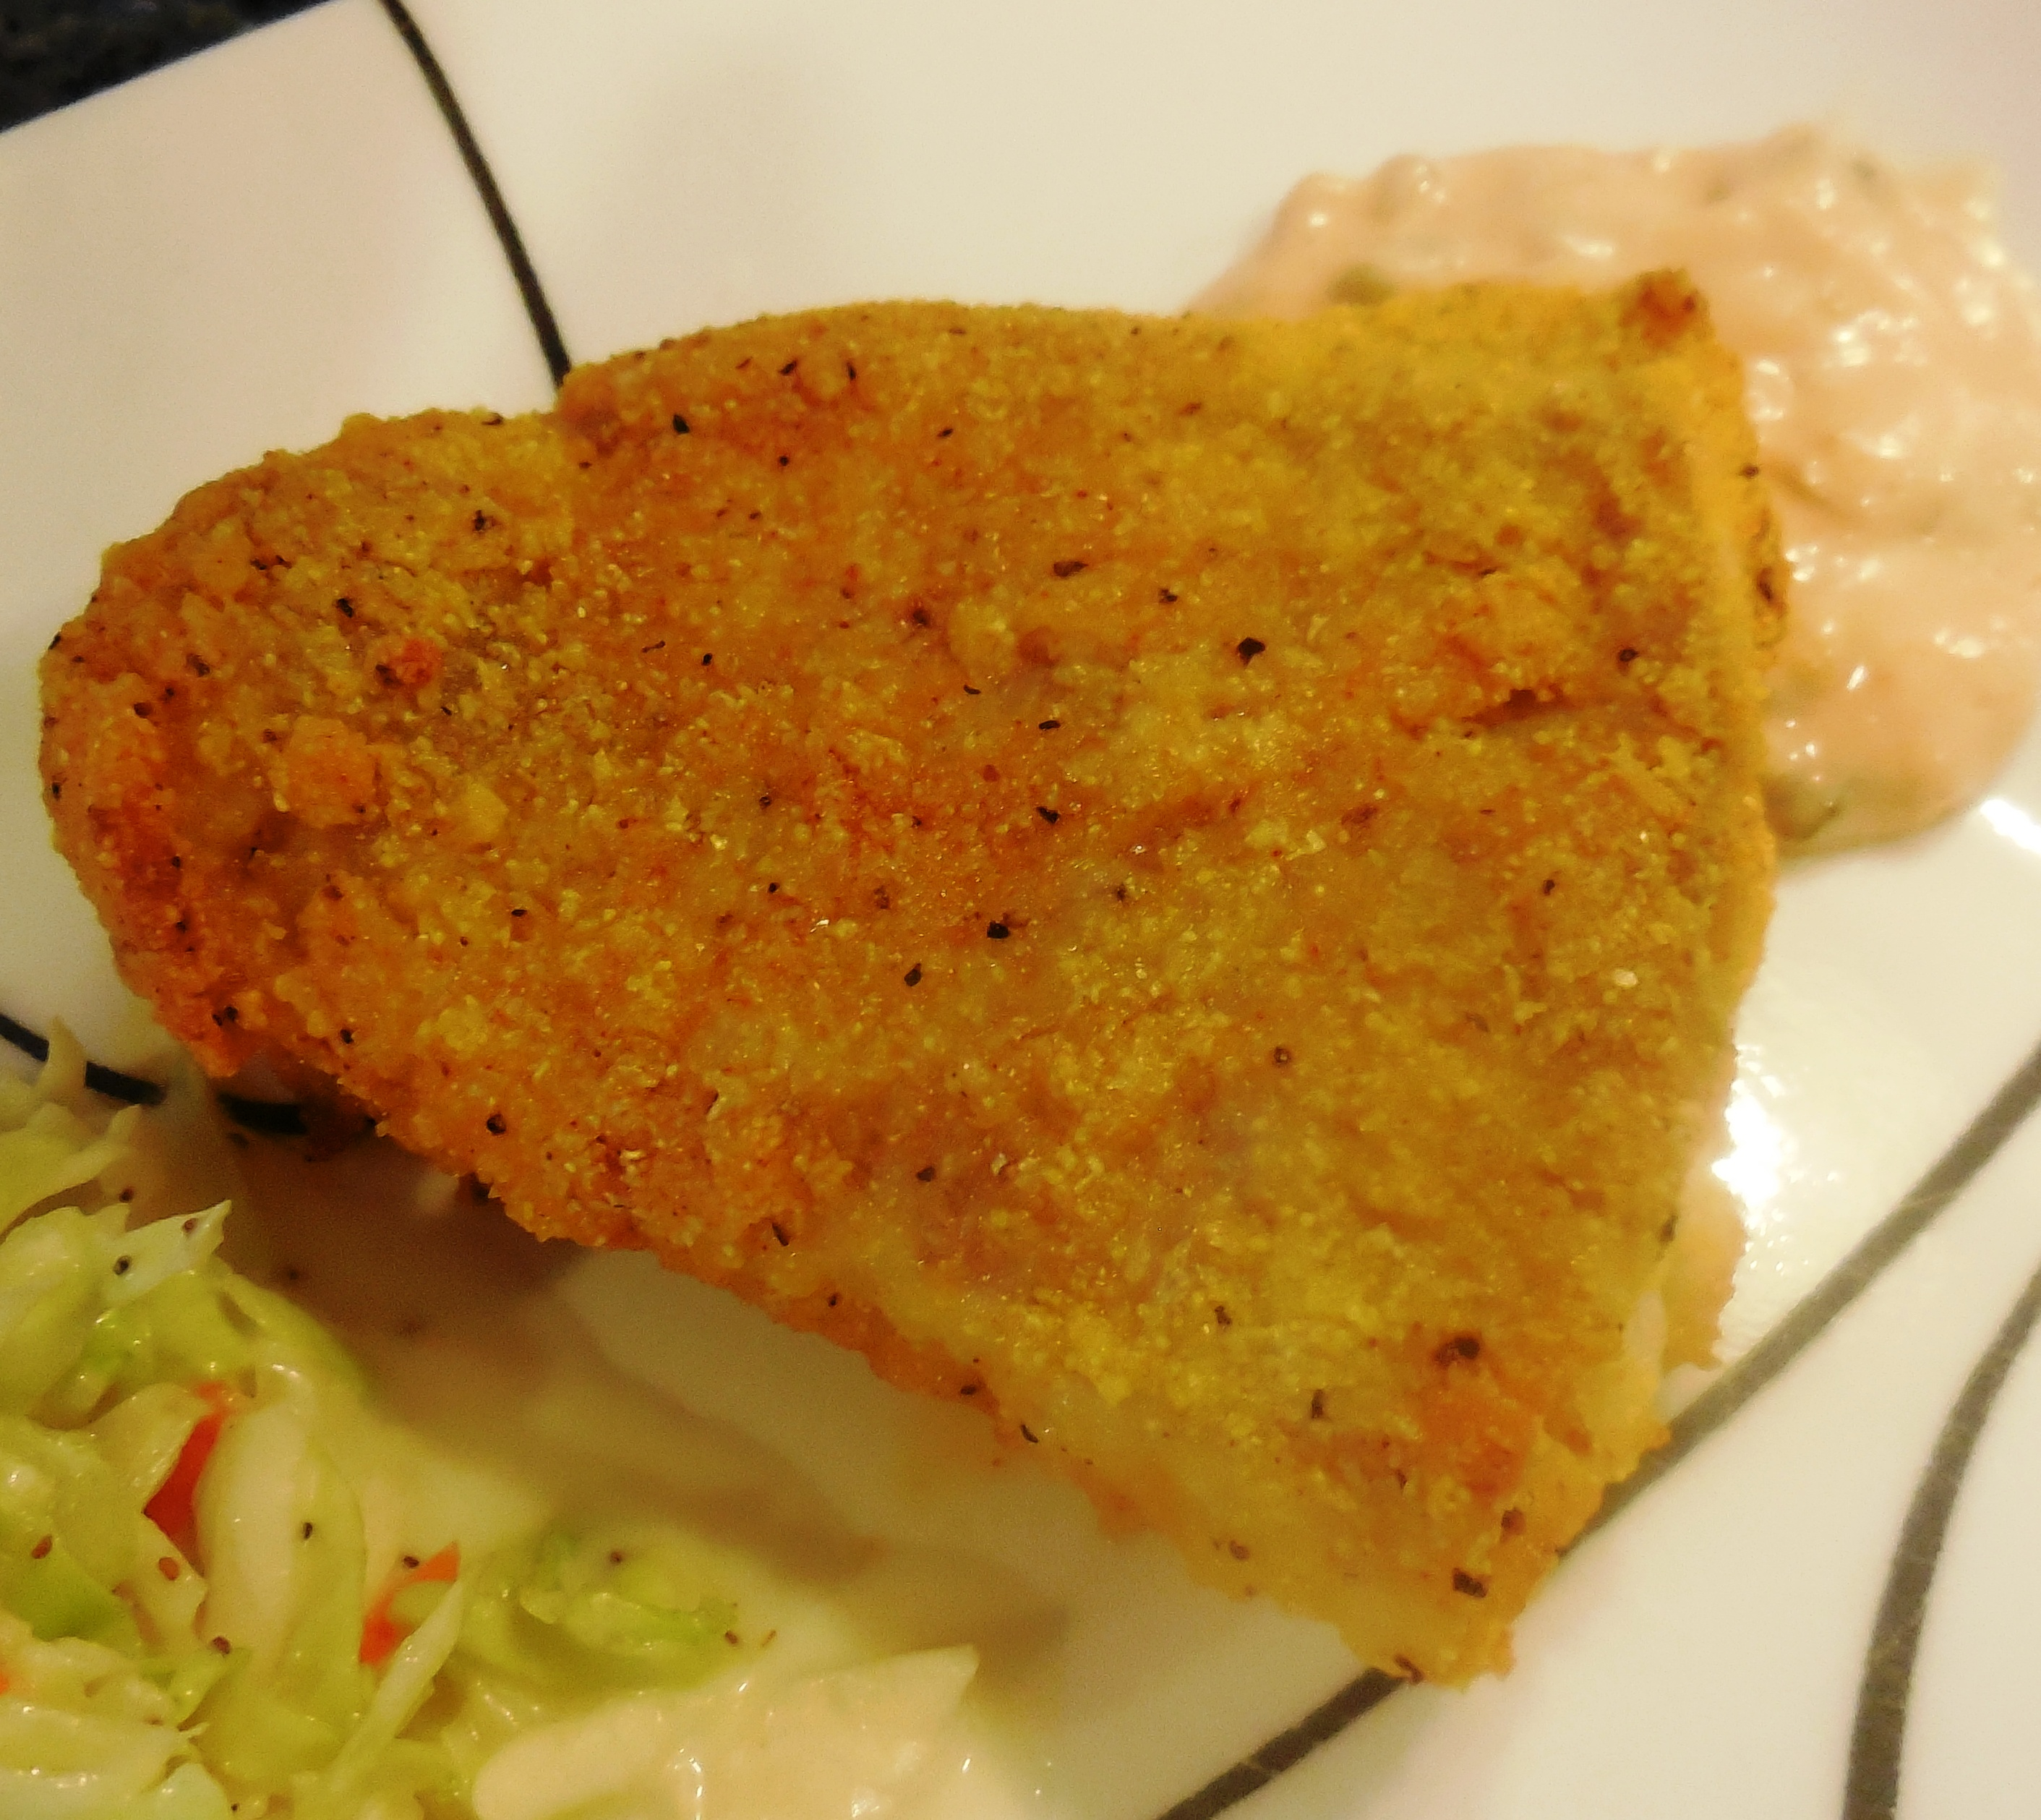 ... oven fried catfish recipe yummly fast easy oven fried catfish recipe